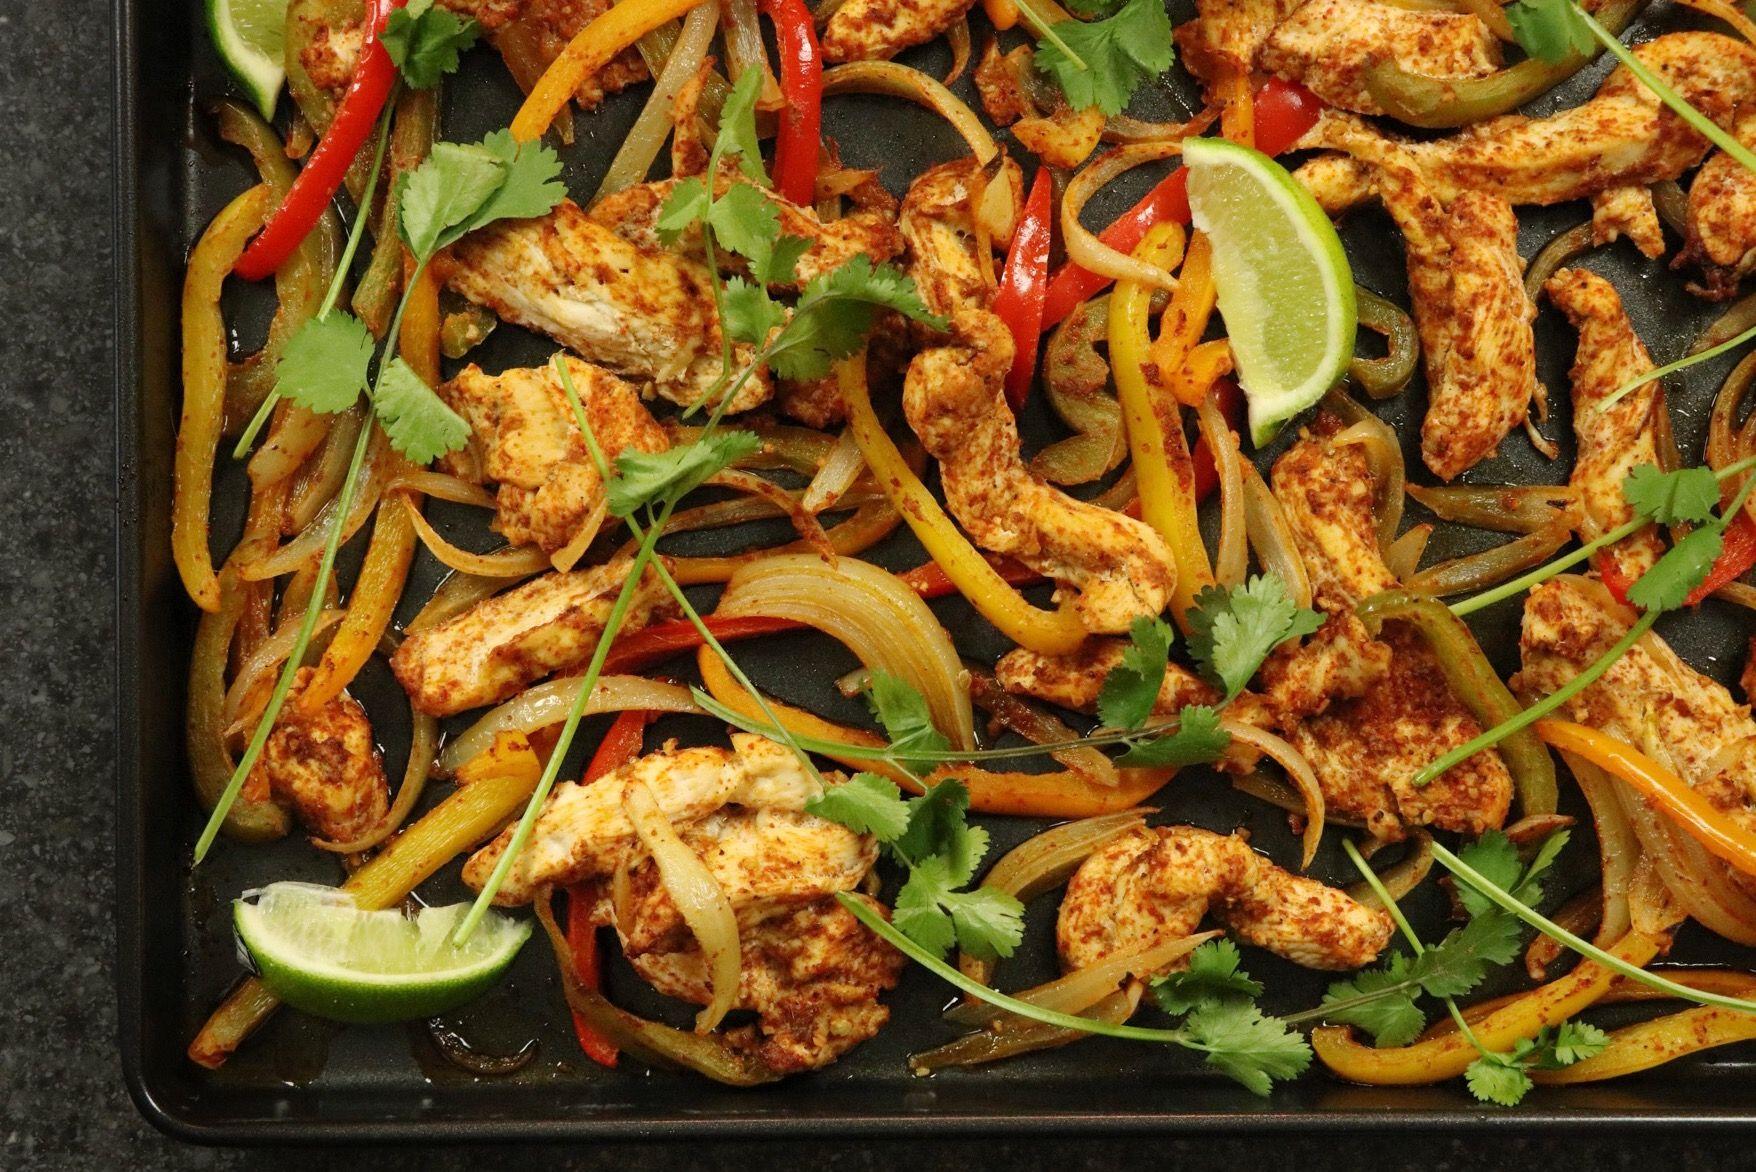 One-Pan Chicken Fajitas - cover